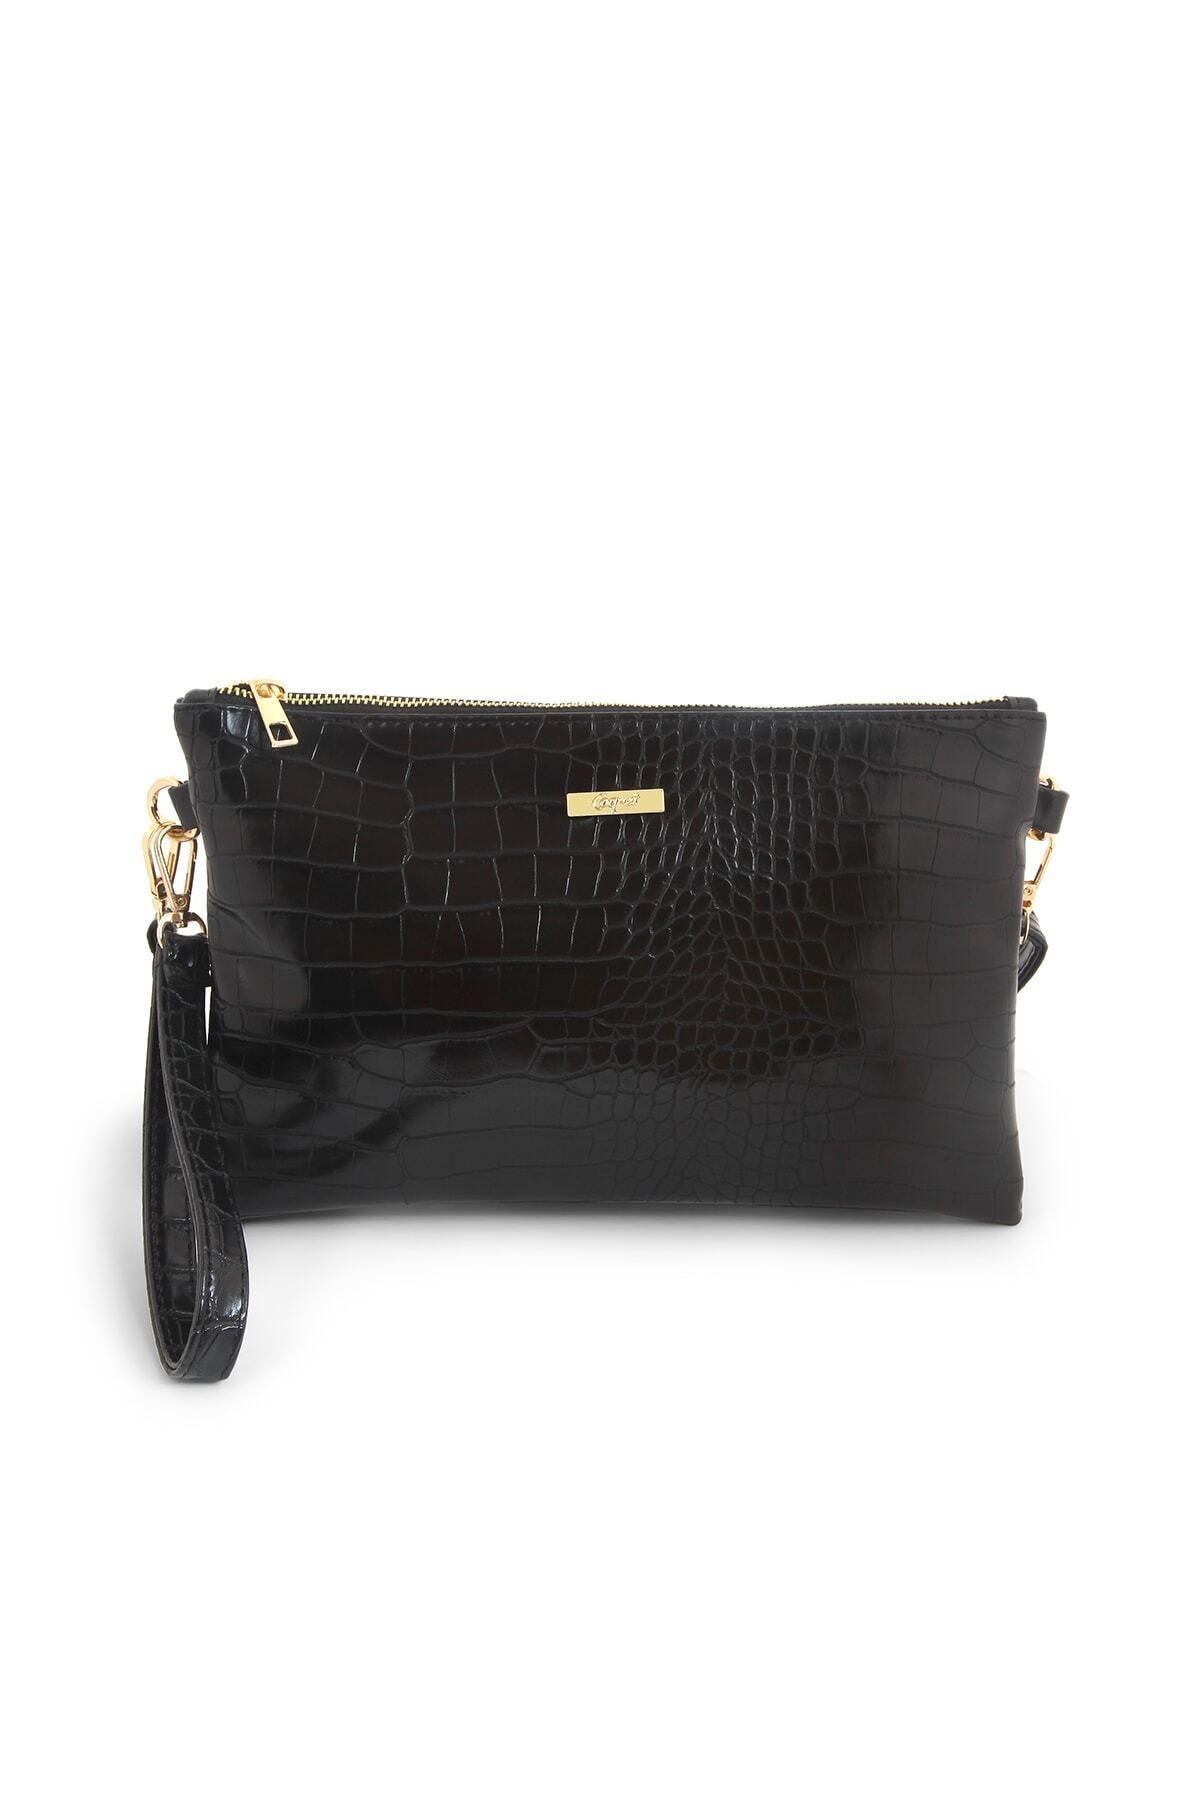 Coquet Accessories Kadın Siyah Pearly Clutch Çanta-19g3u13n001 1